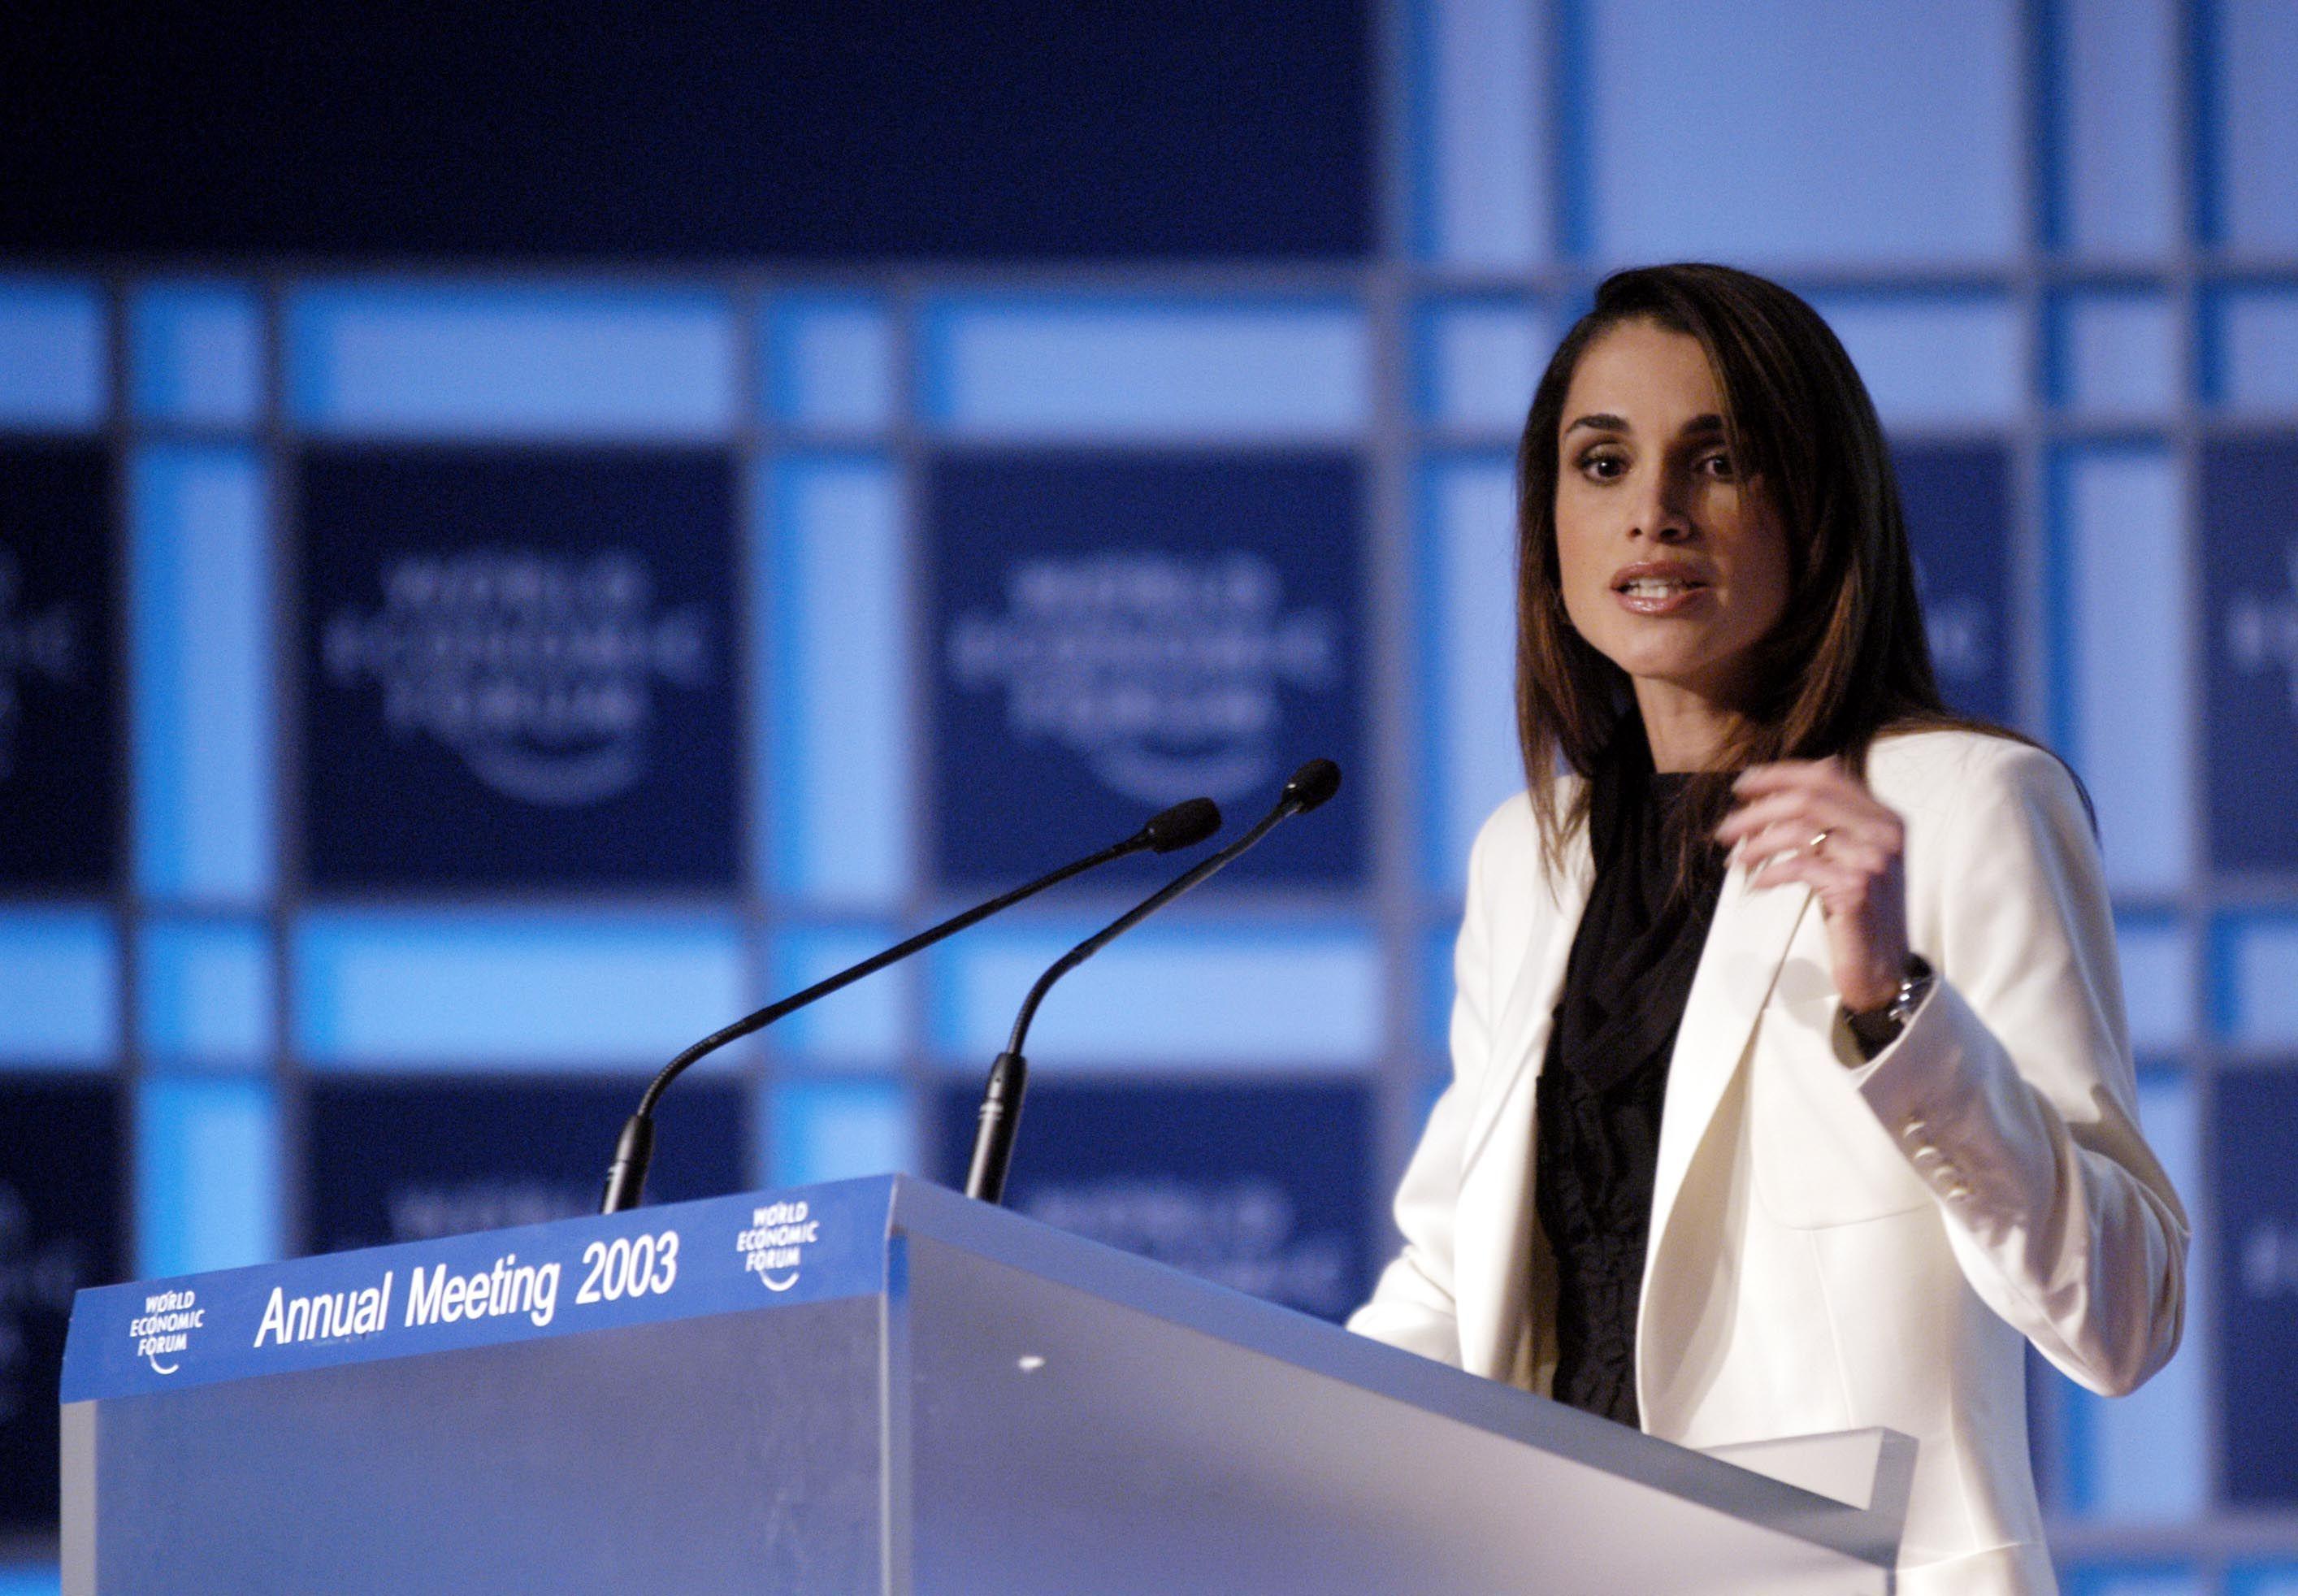 Queen Rania photo gallery